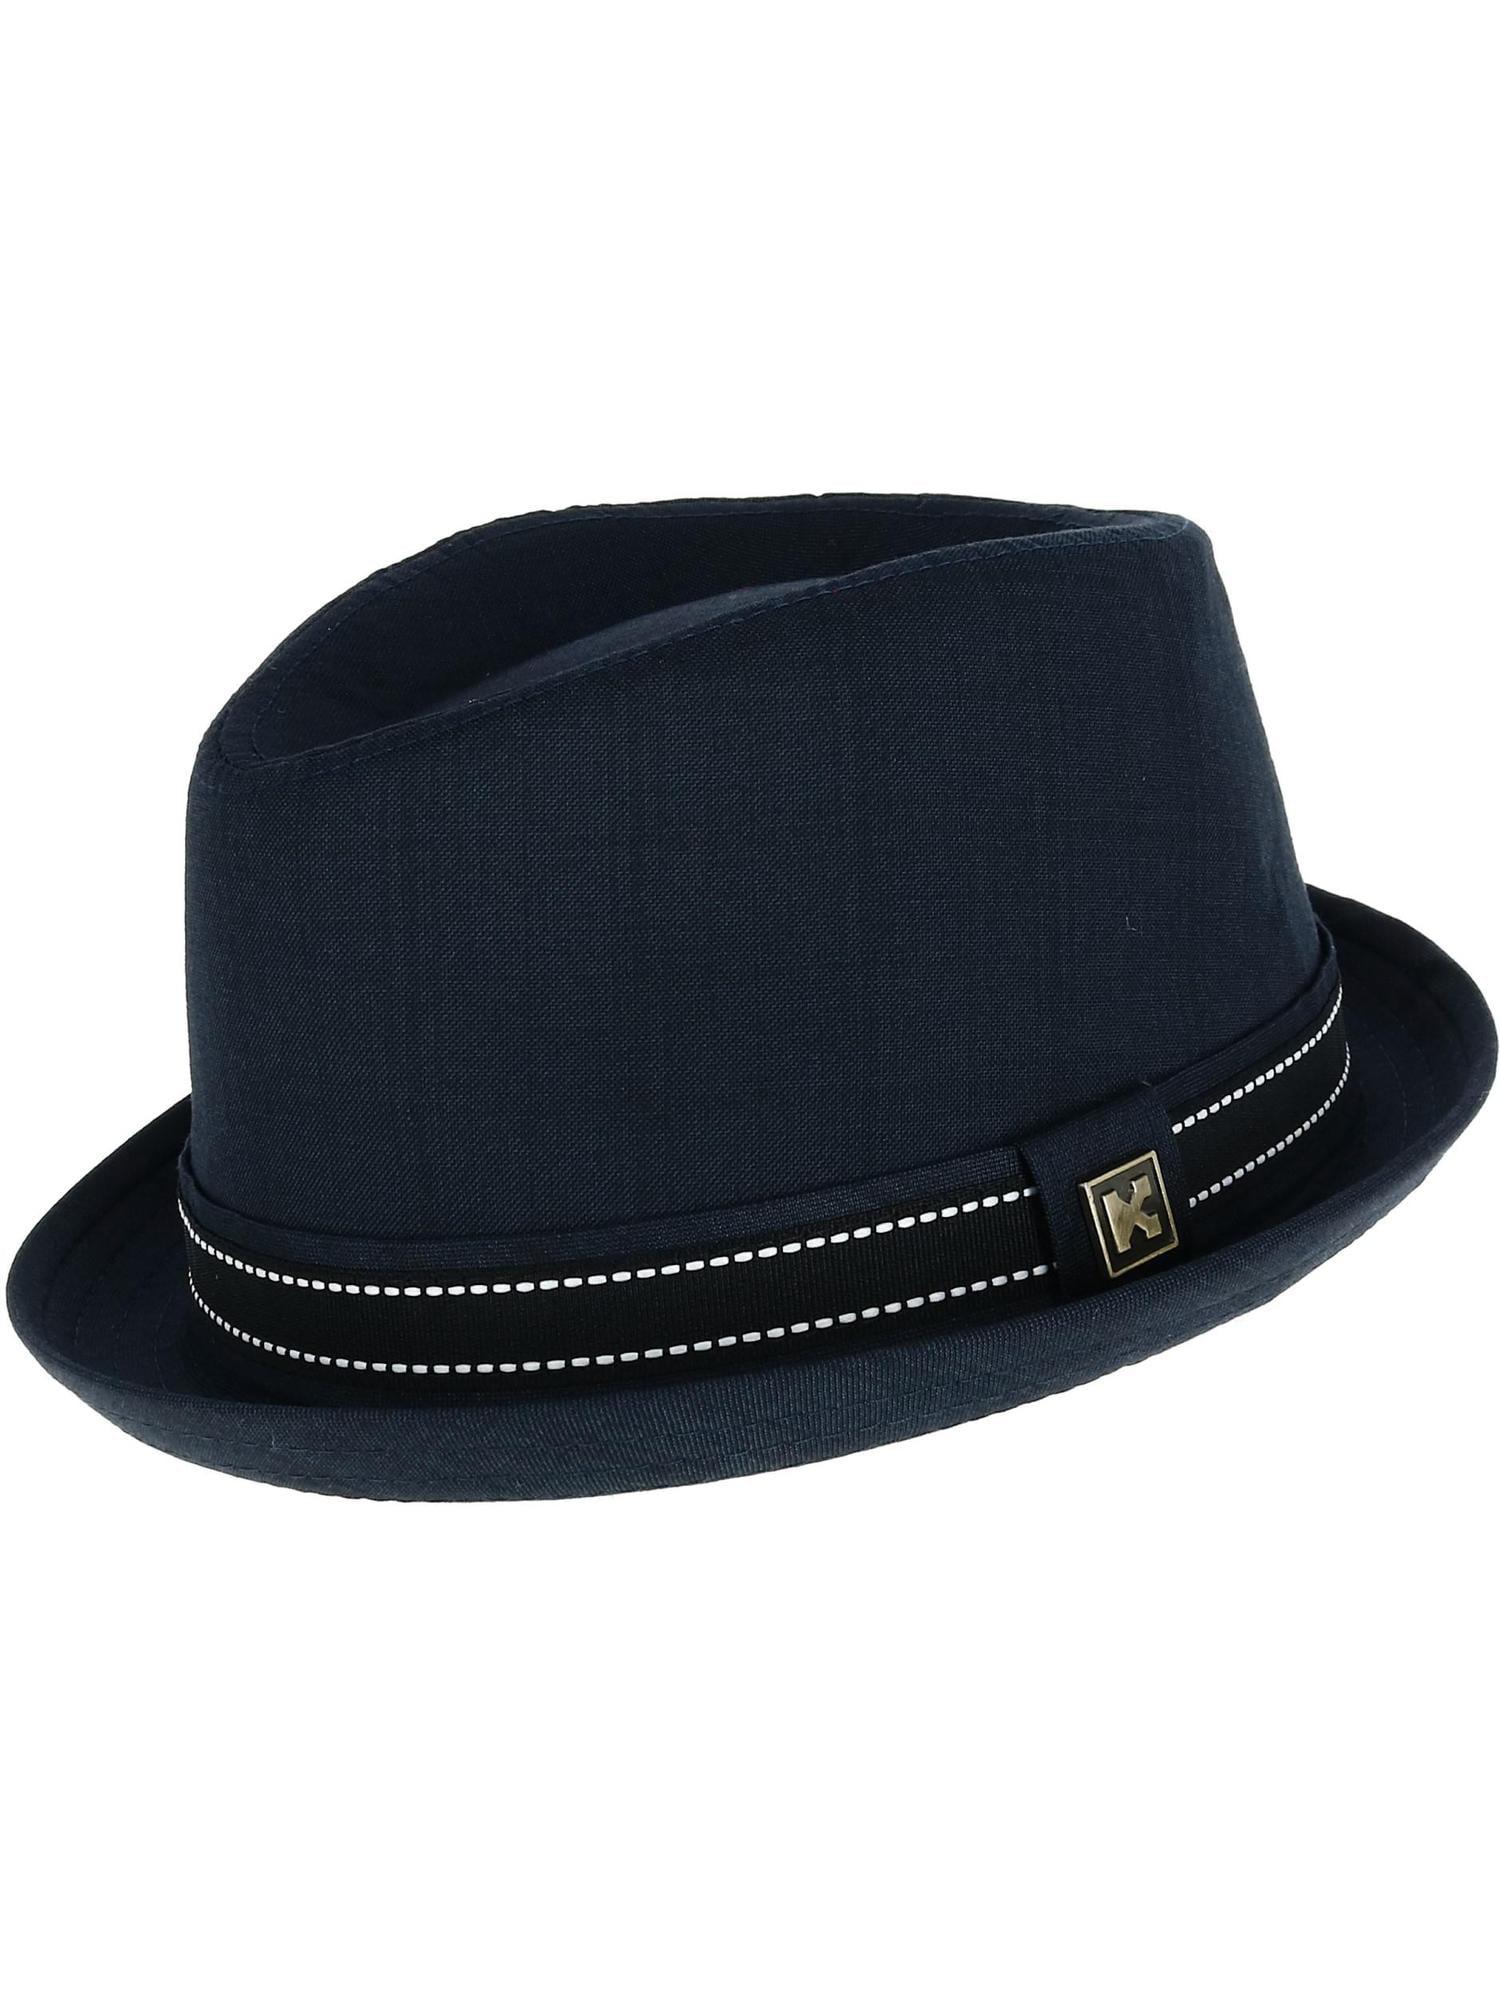 "Broner Wool Felt Porkpie Hat 1 3//4/"" Turned Up Brim"